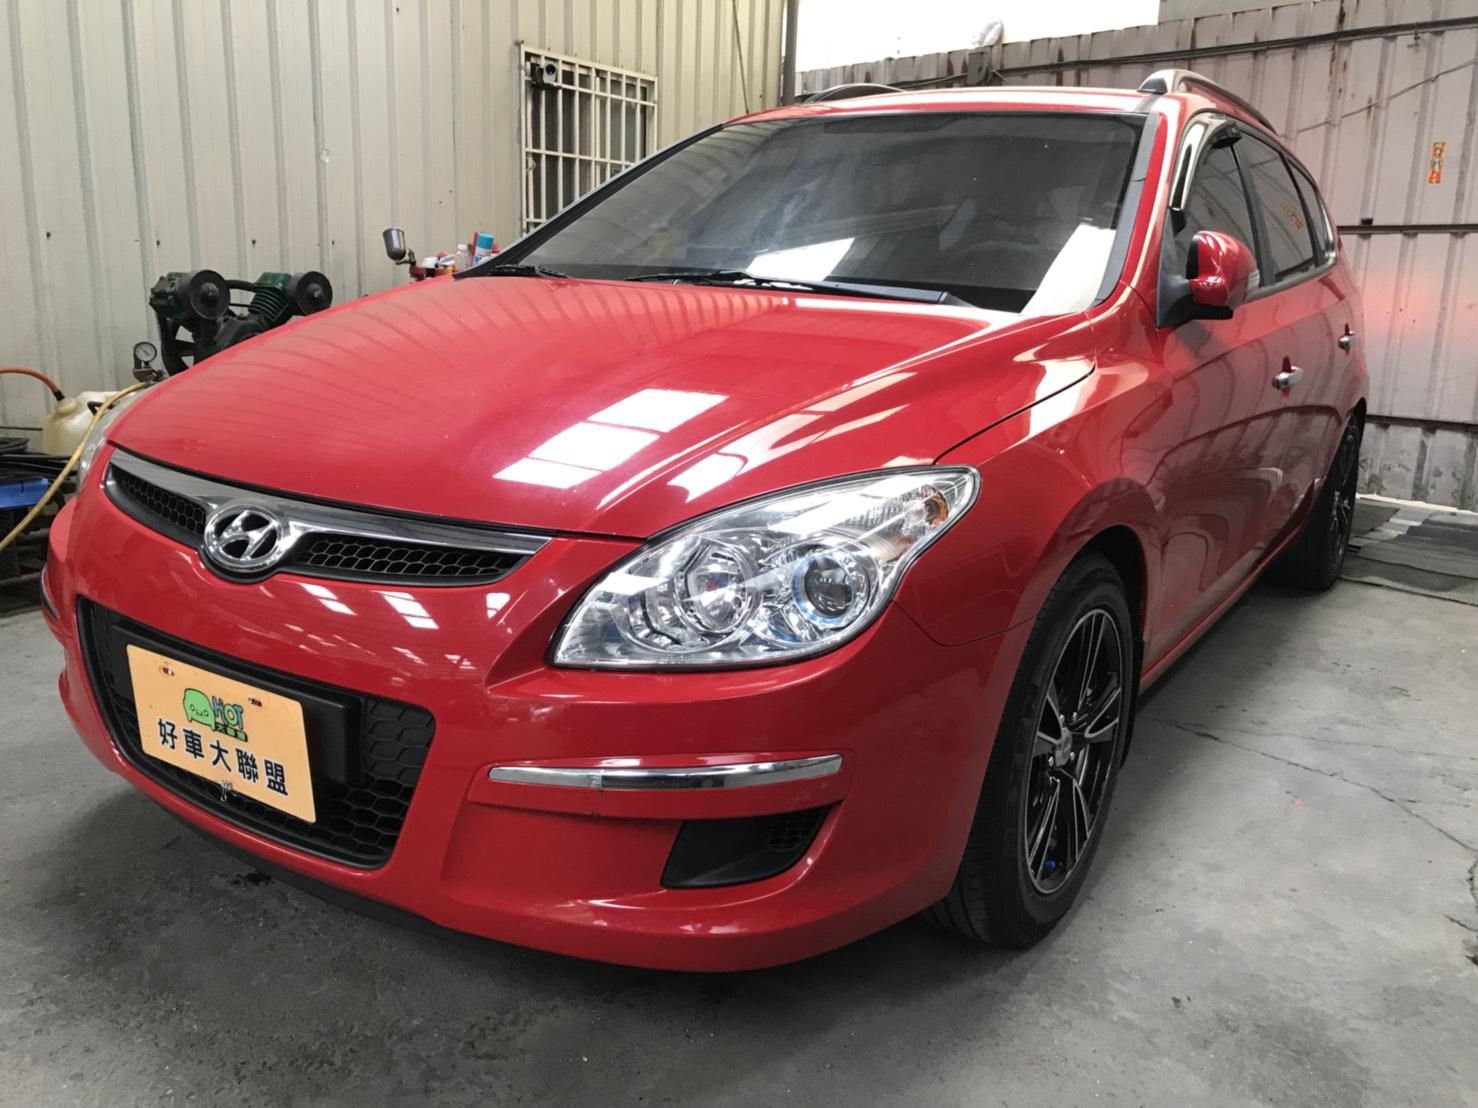 2009 Hyundai I30 cw